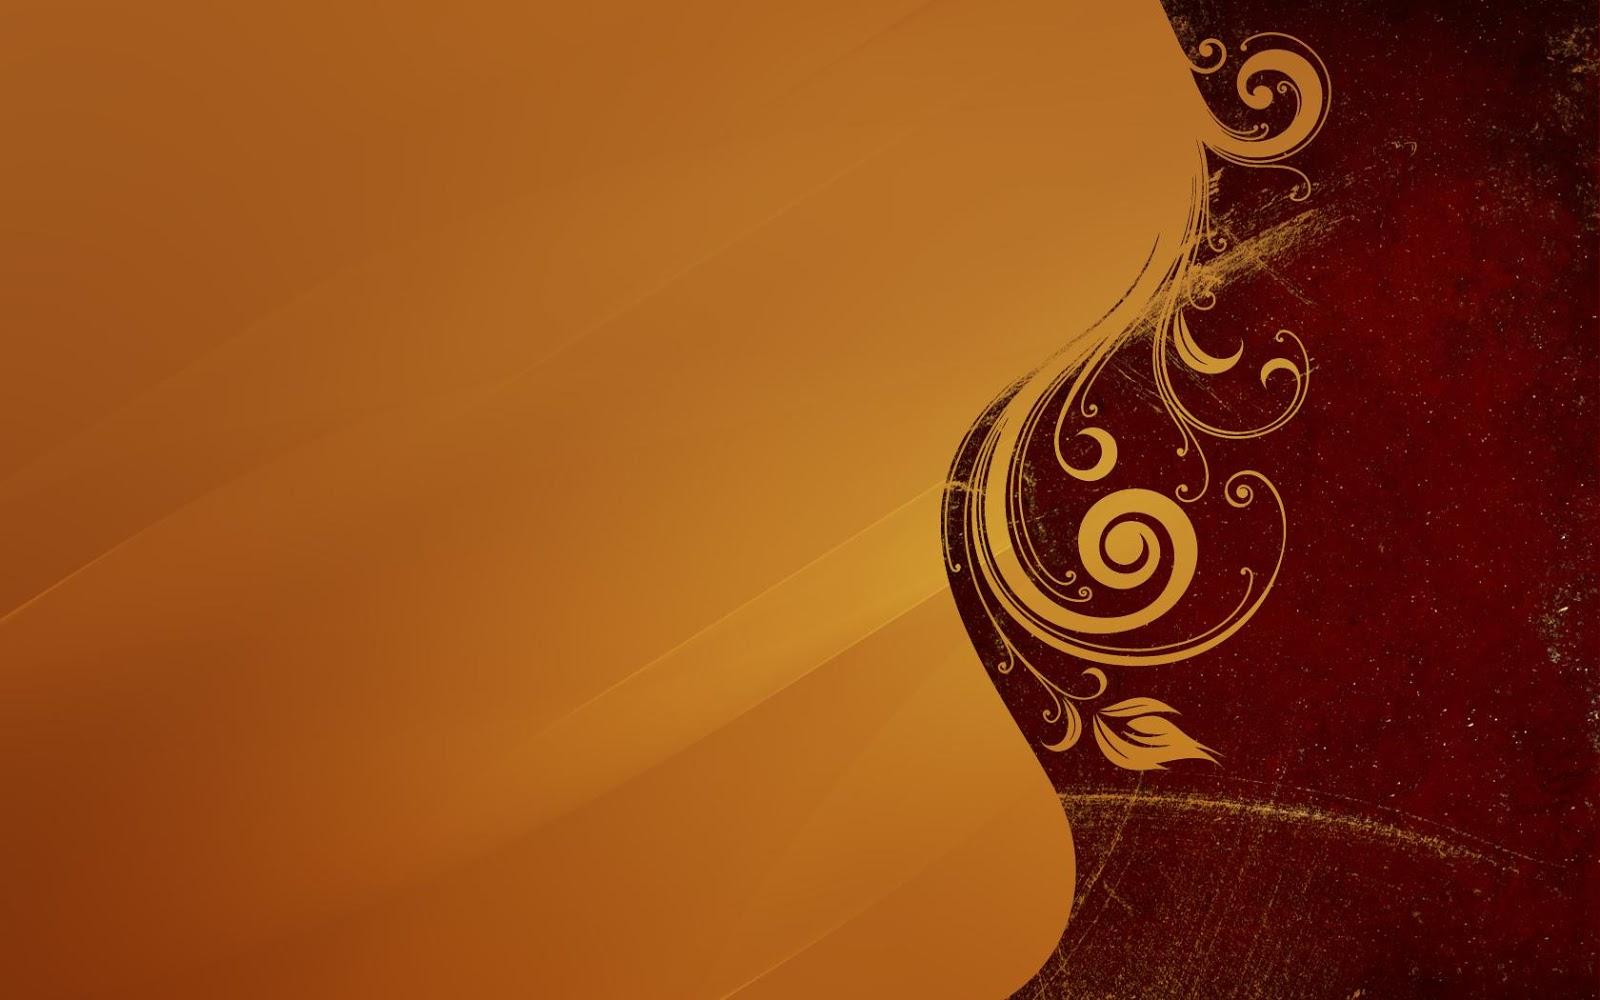 Contoh Baground Abstrak | Joy Studio Design Gallery - Best Design